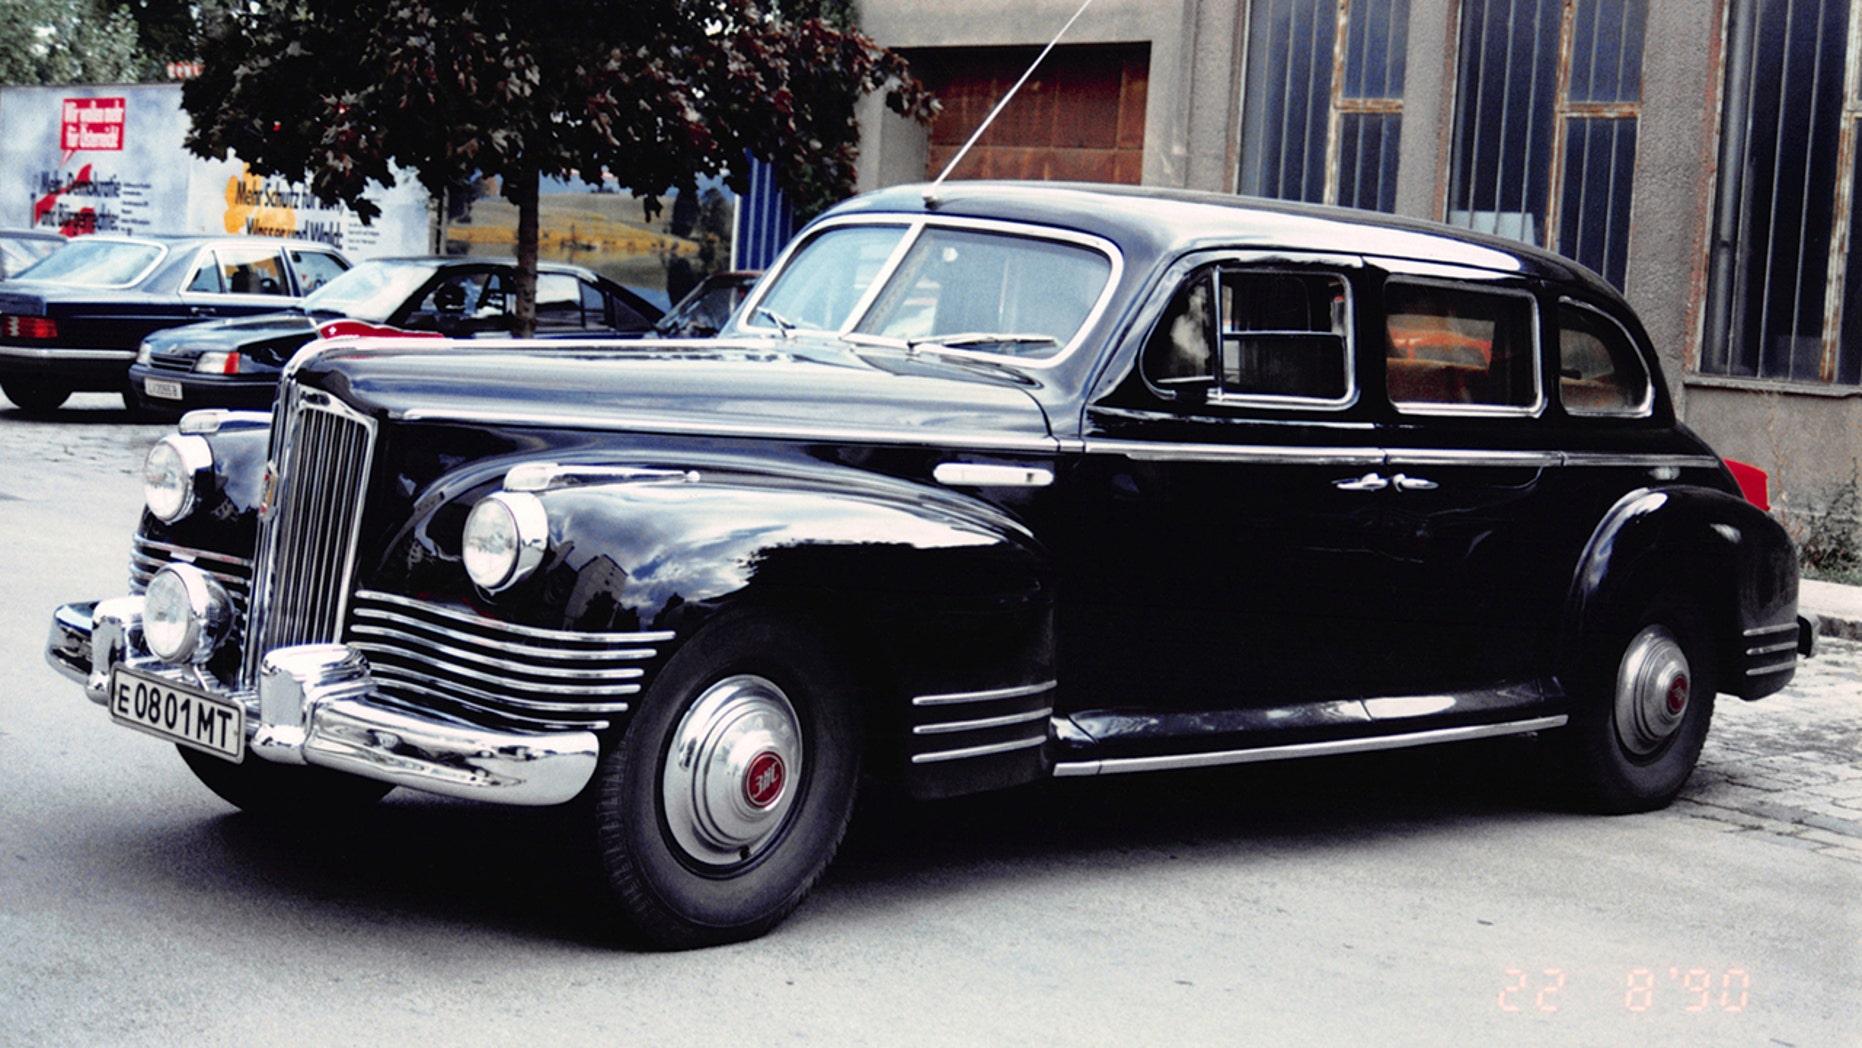 Josef Stalin's $2.8M armored limo